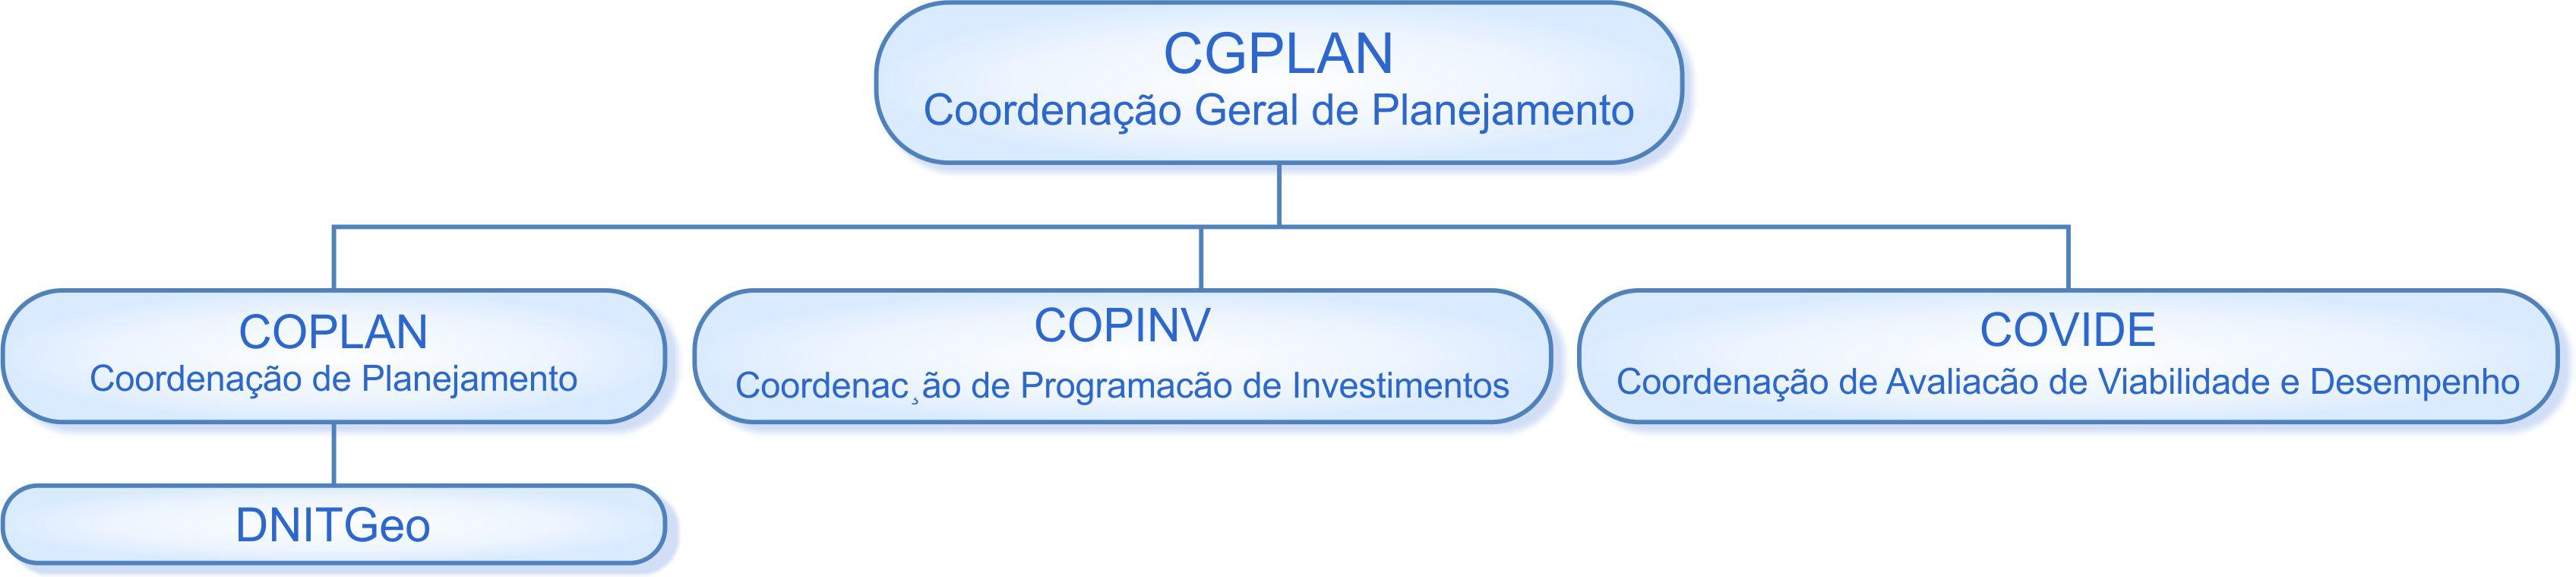 CGPLAN.jpg